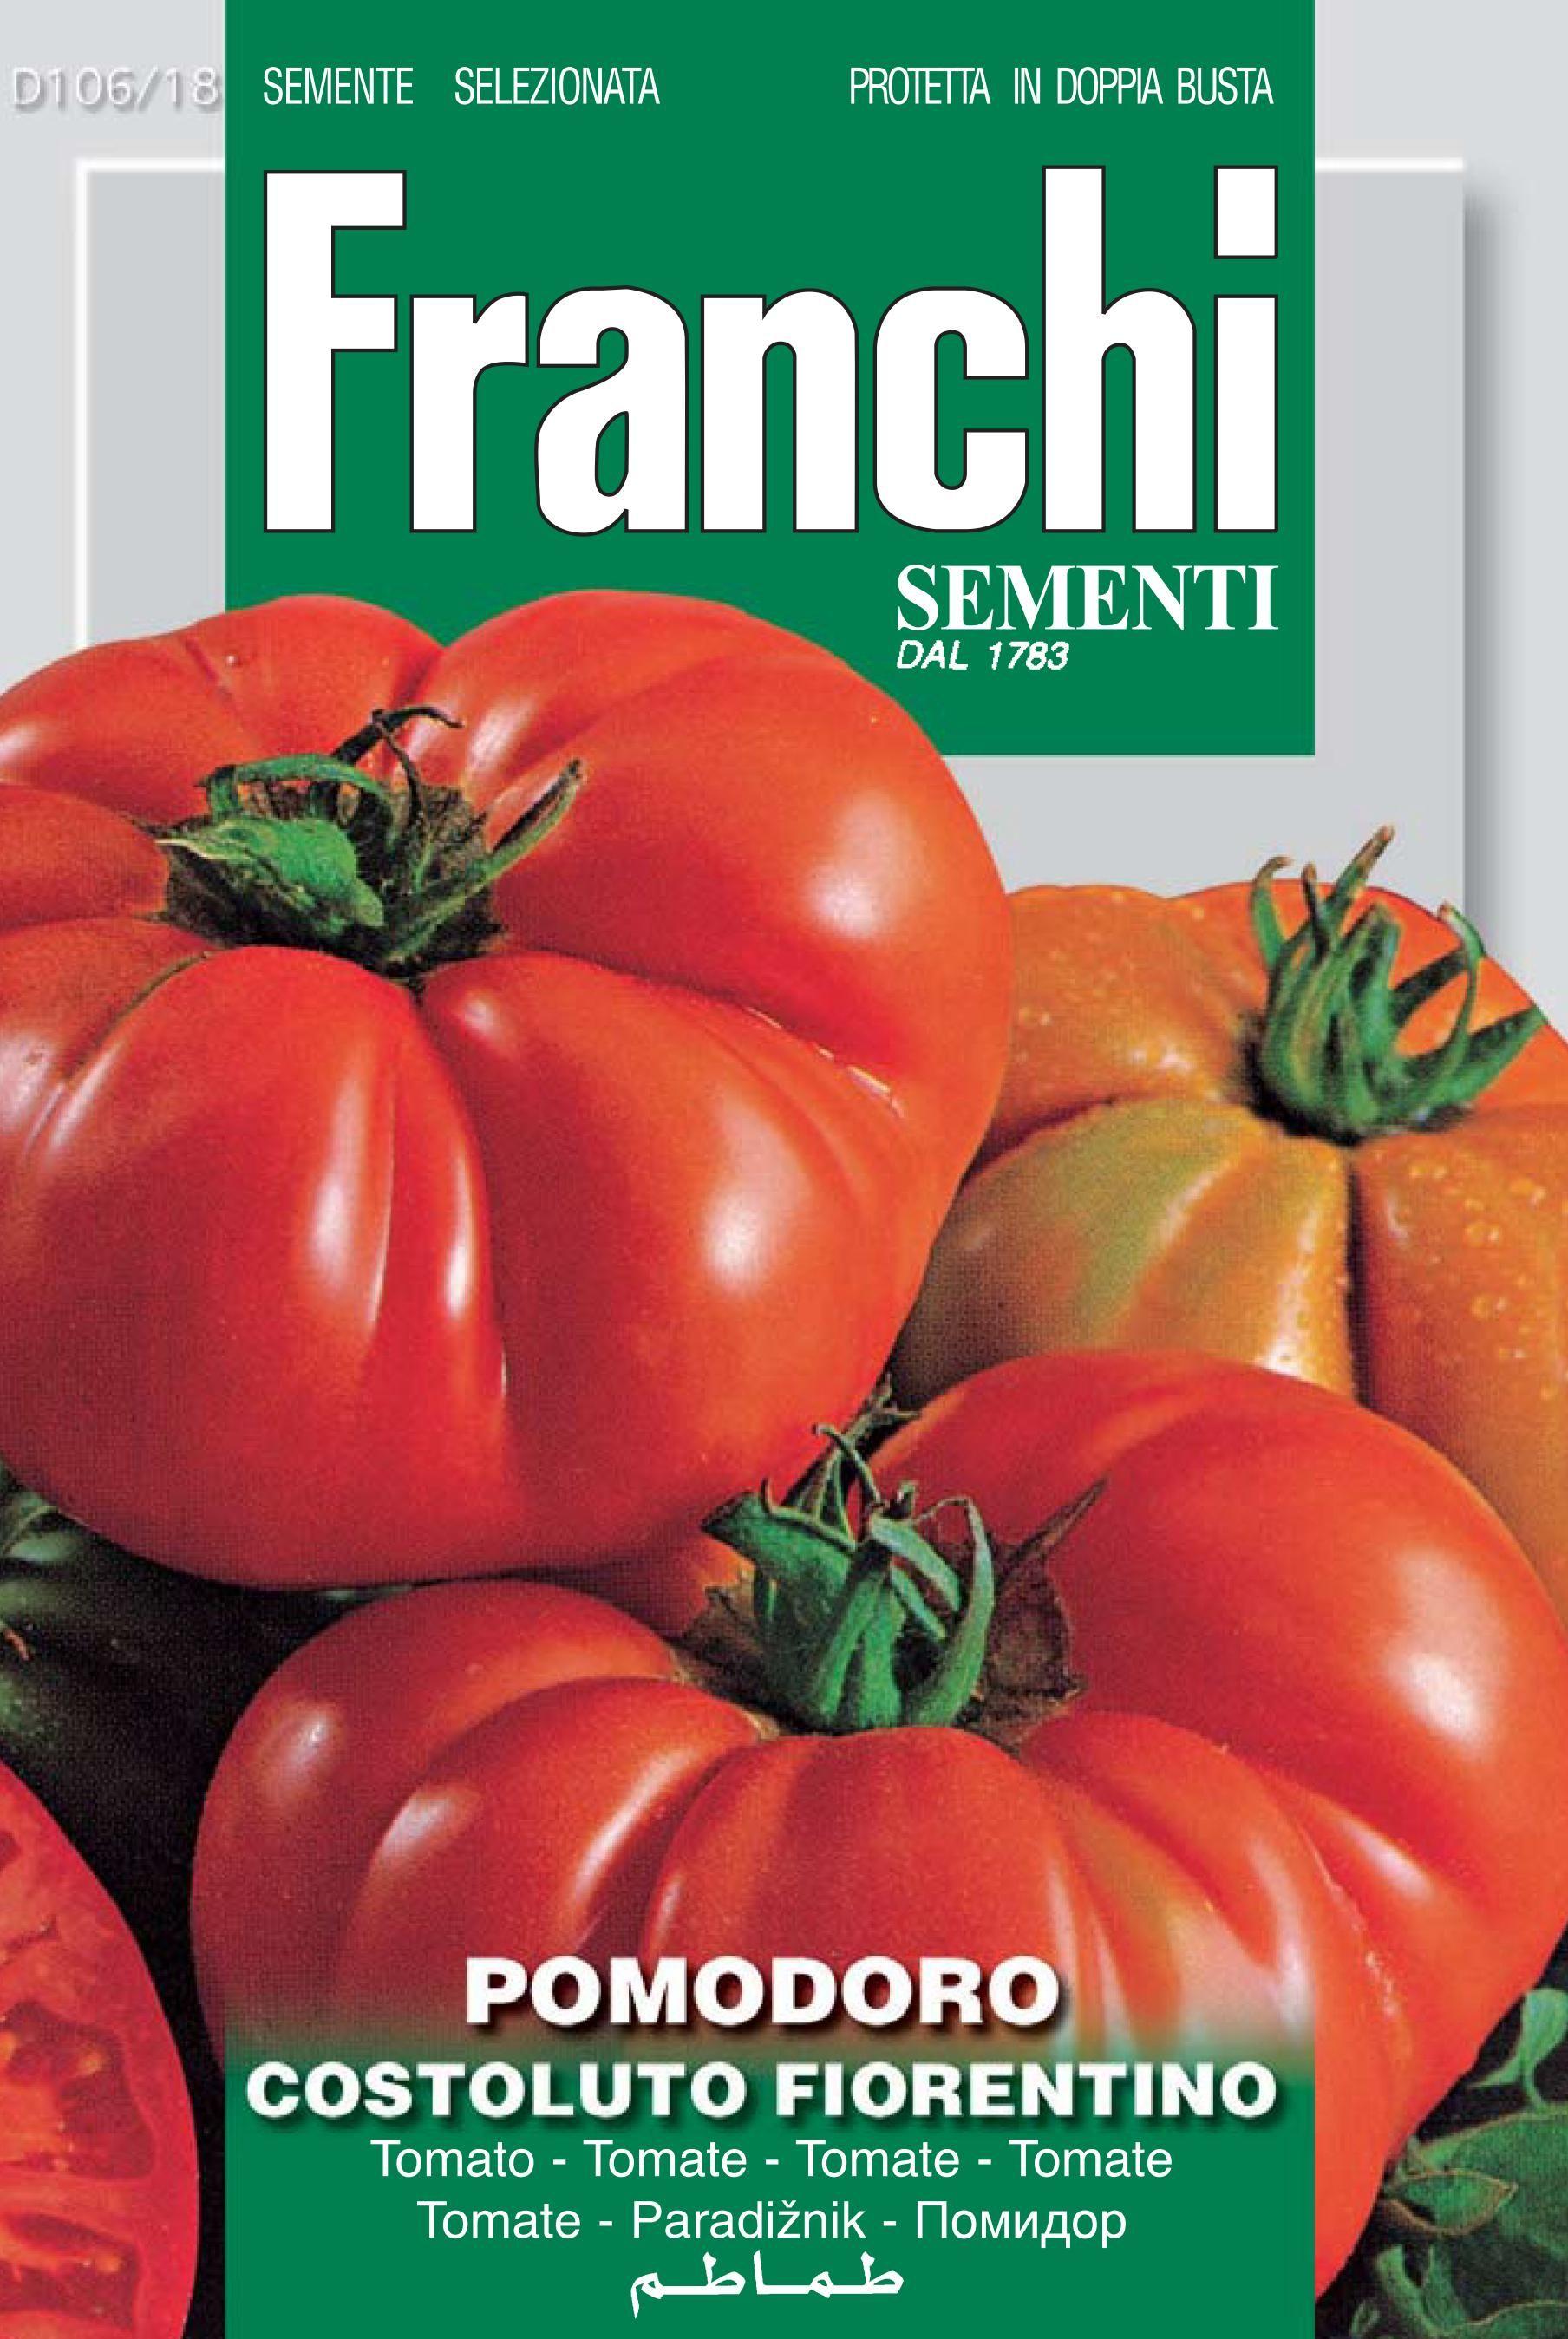 Seeds of Italy Ltd